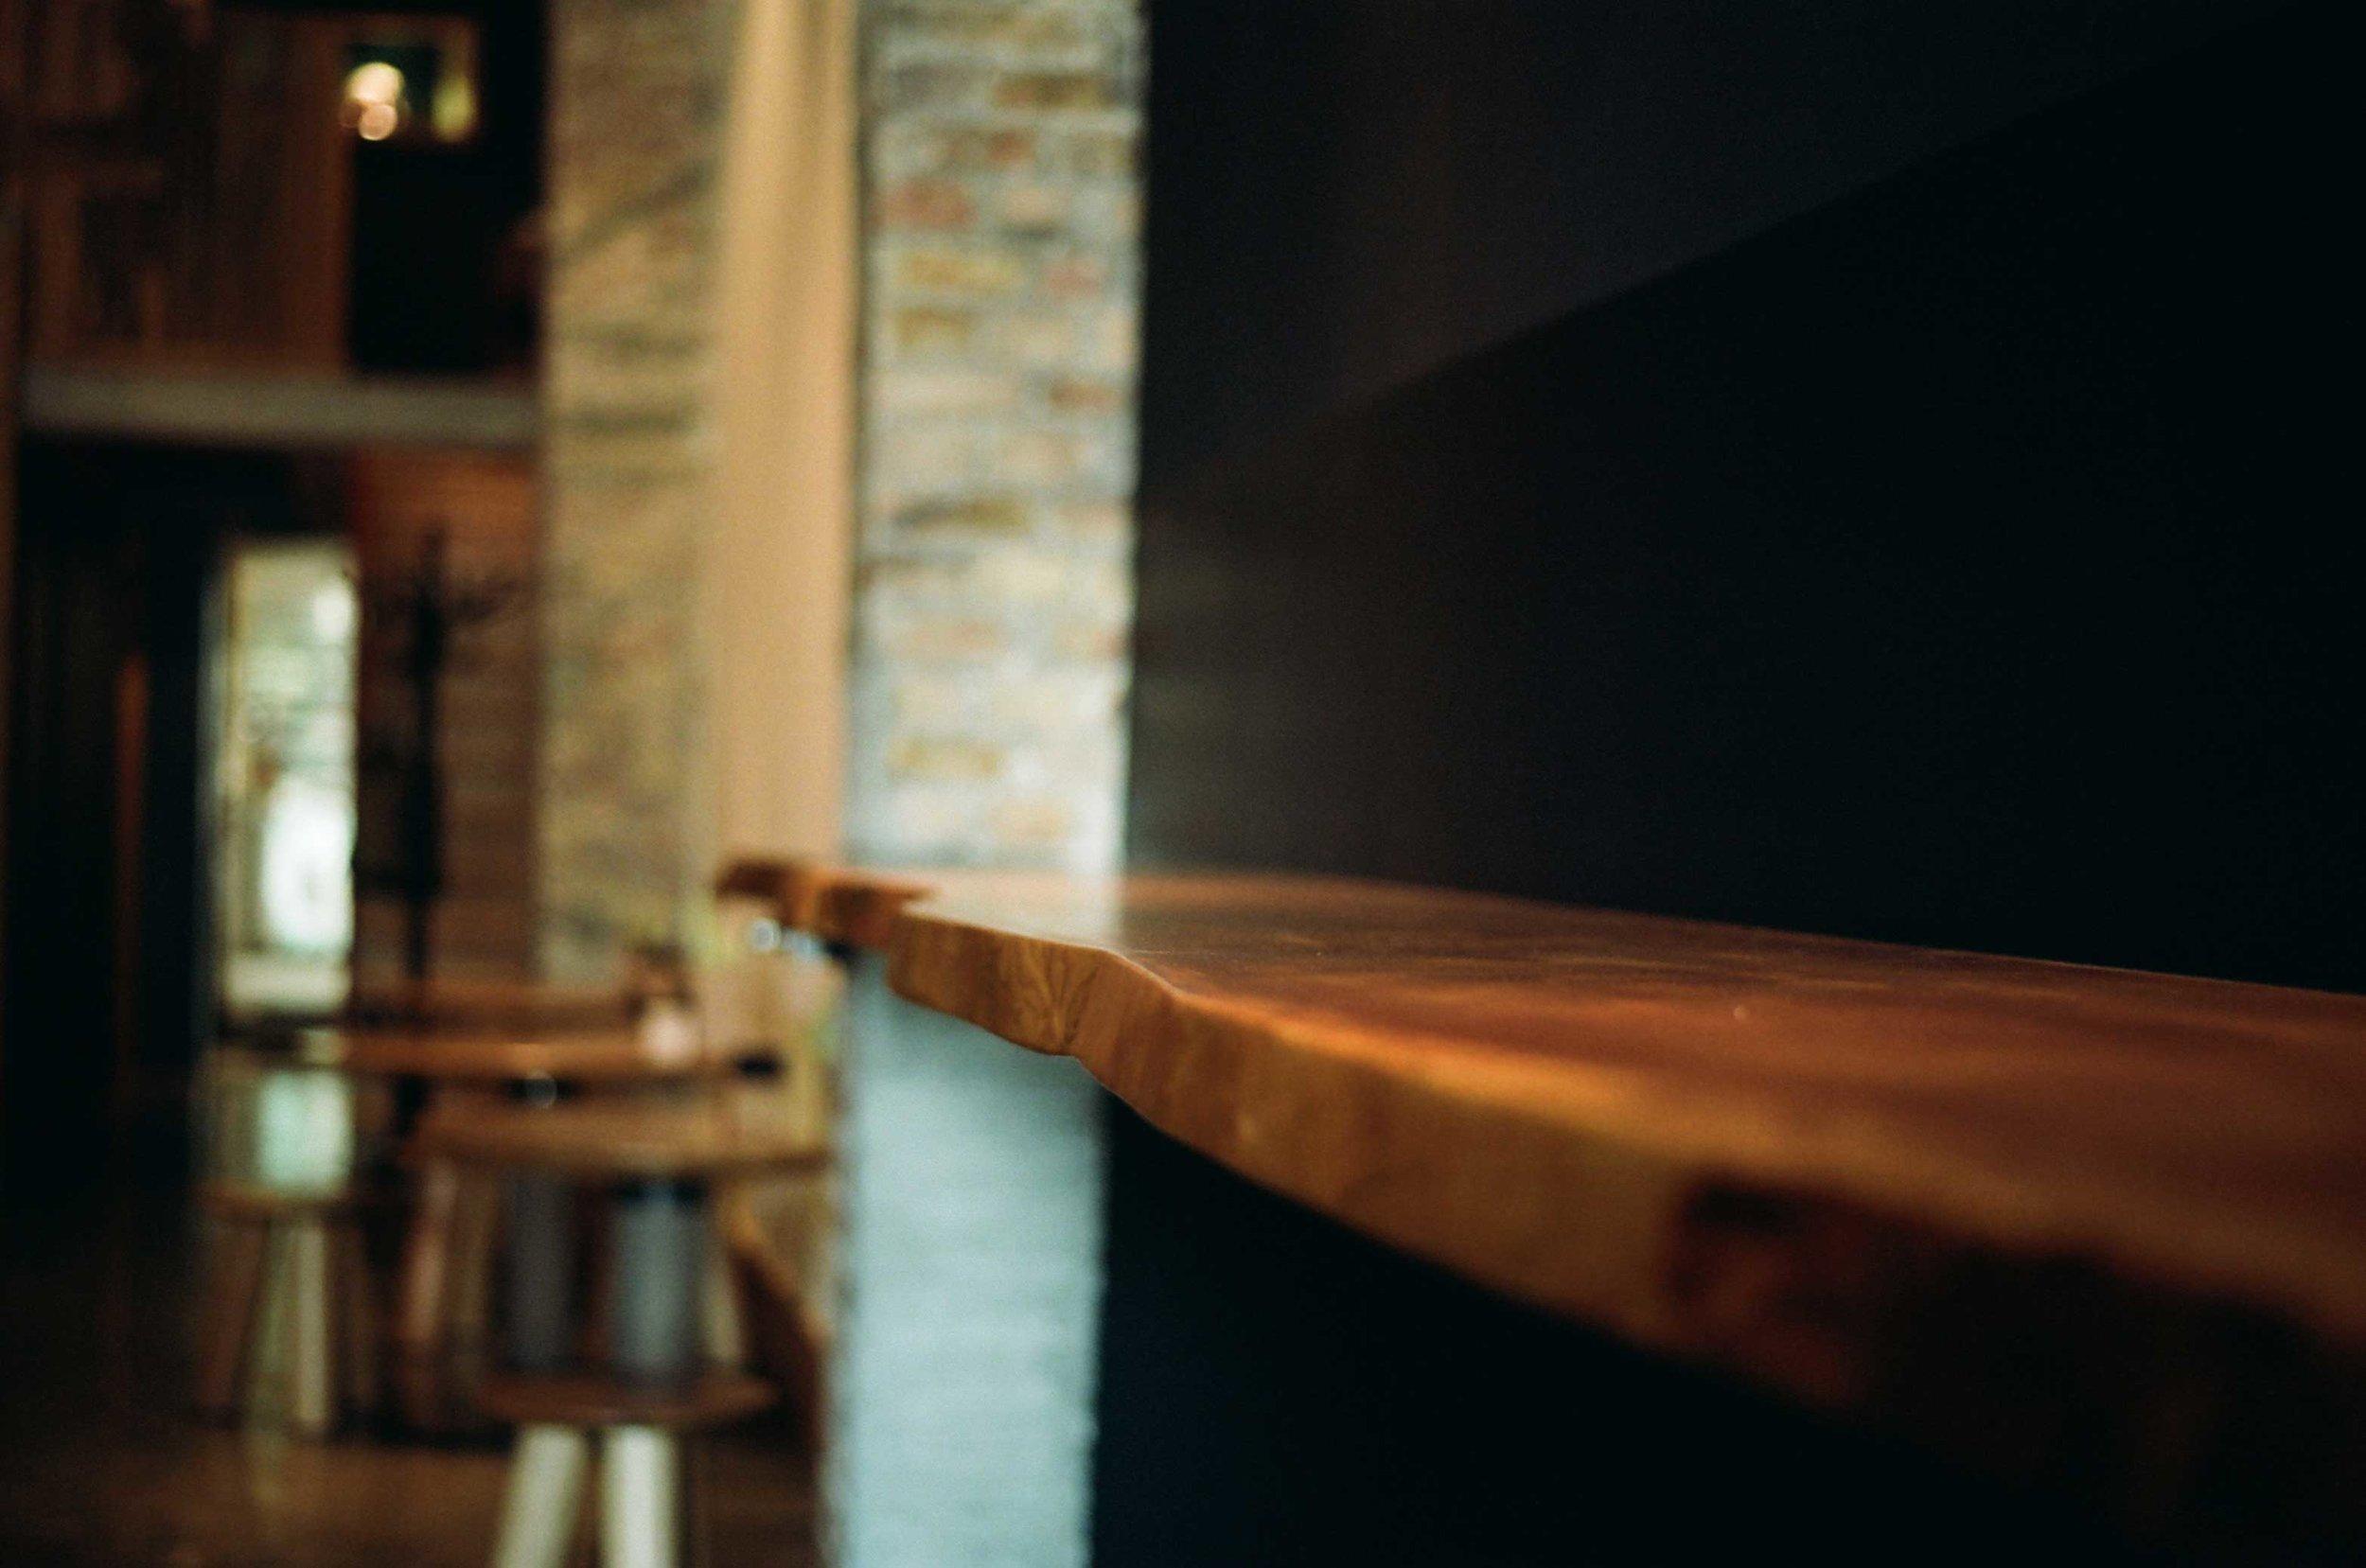 Cafe Laitcha Adeline Grattard  Fragos + Lecourtier architects  fragoslecourtier.com